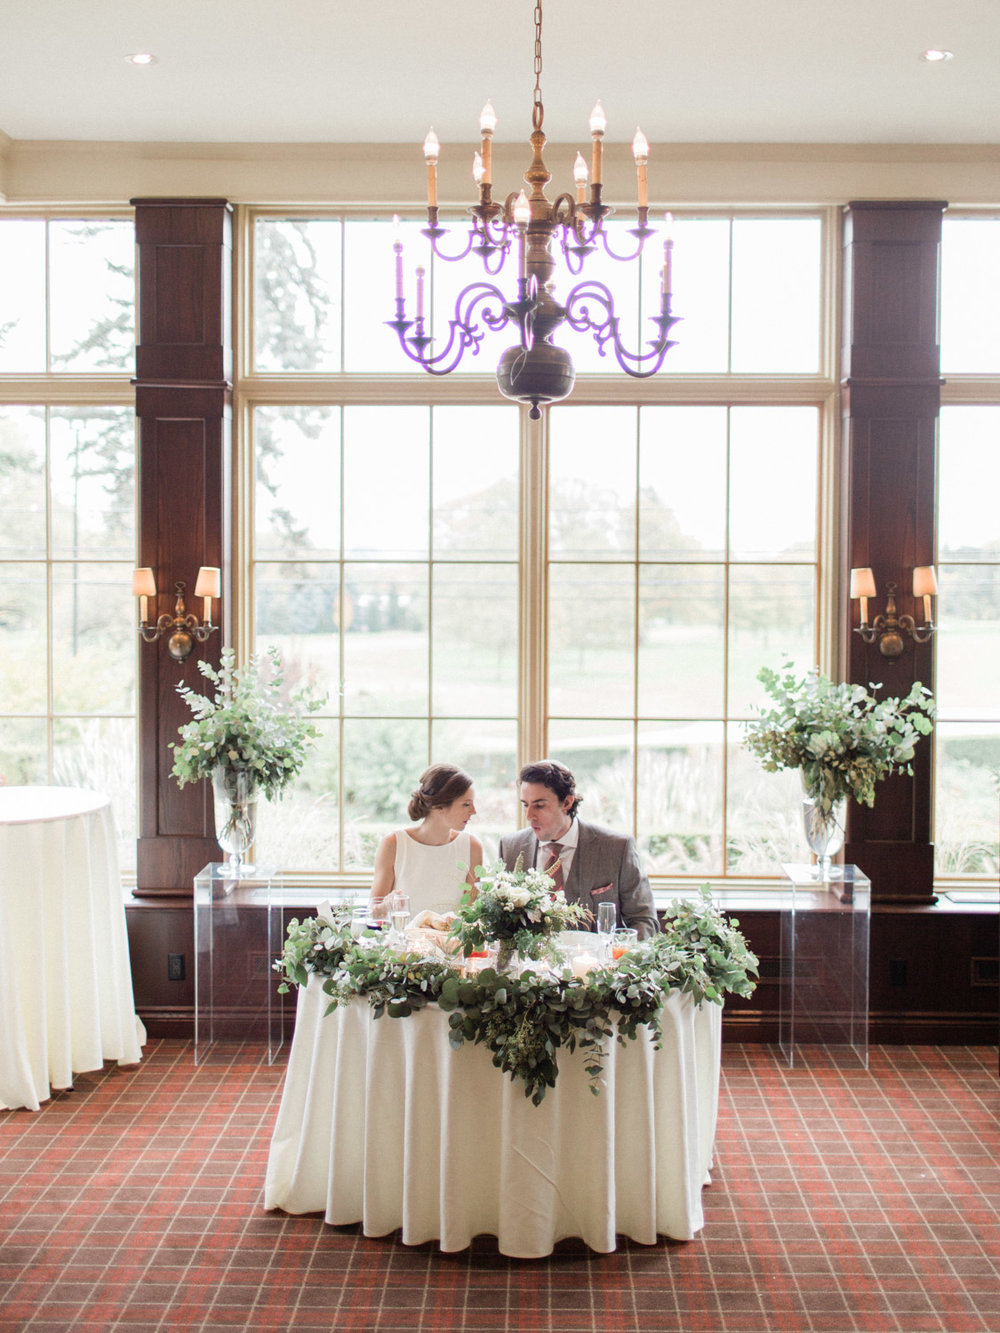 Toronto-wedding-photographer-st-georges-golf-club-jewish-modern-fall82.jpg